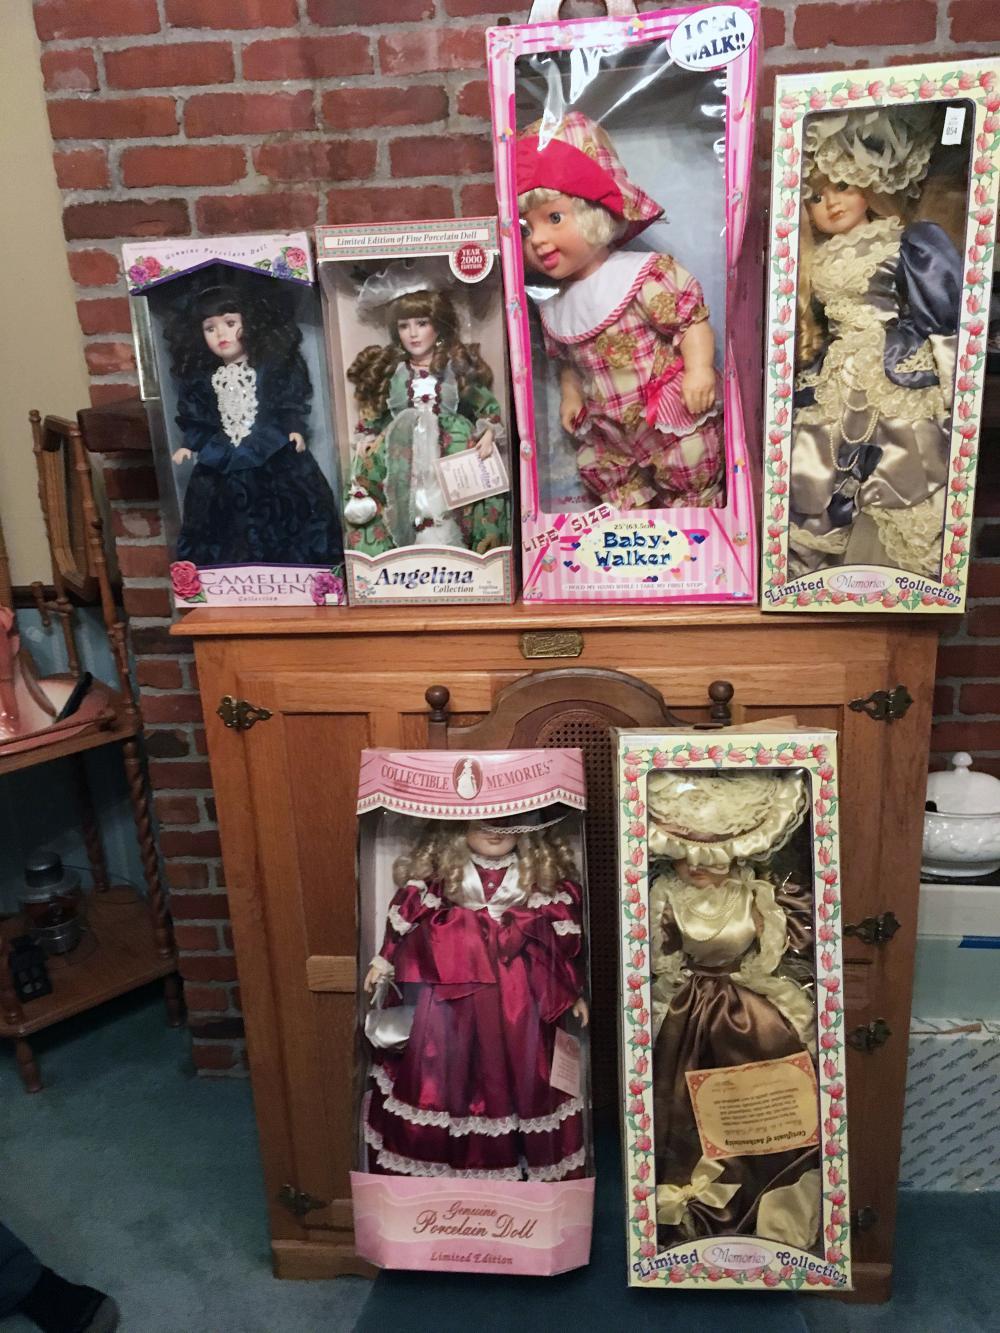 6 Porcelain Collector's Dolls